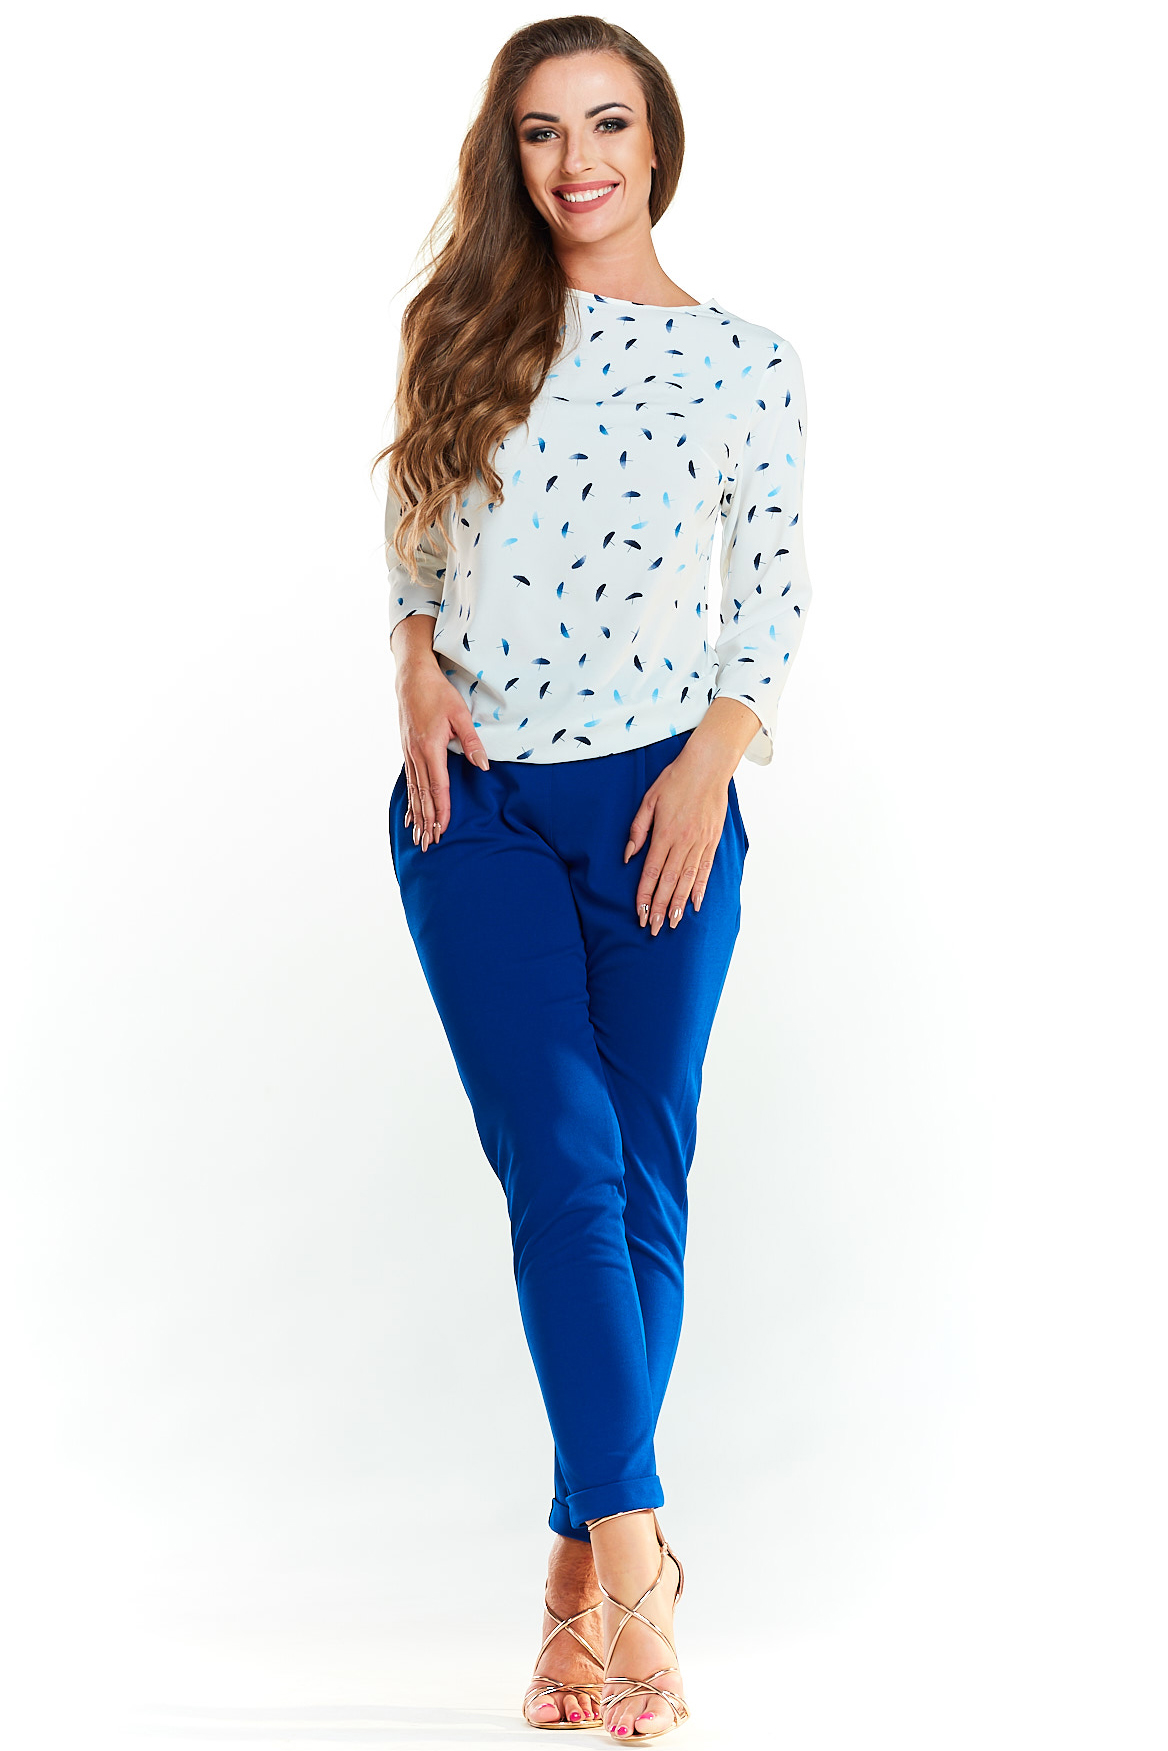 CM3977 Klasyczna elegancka bluzka - niebieskie parasolki